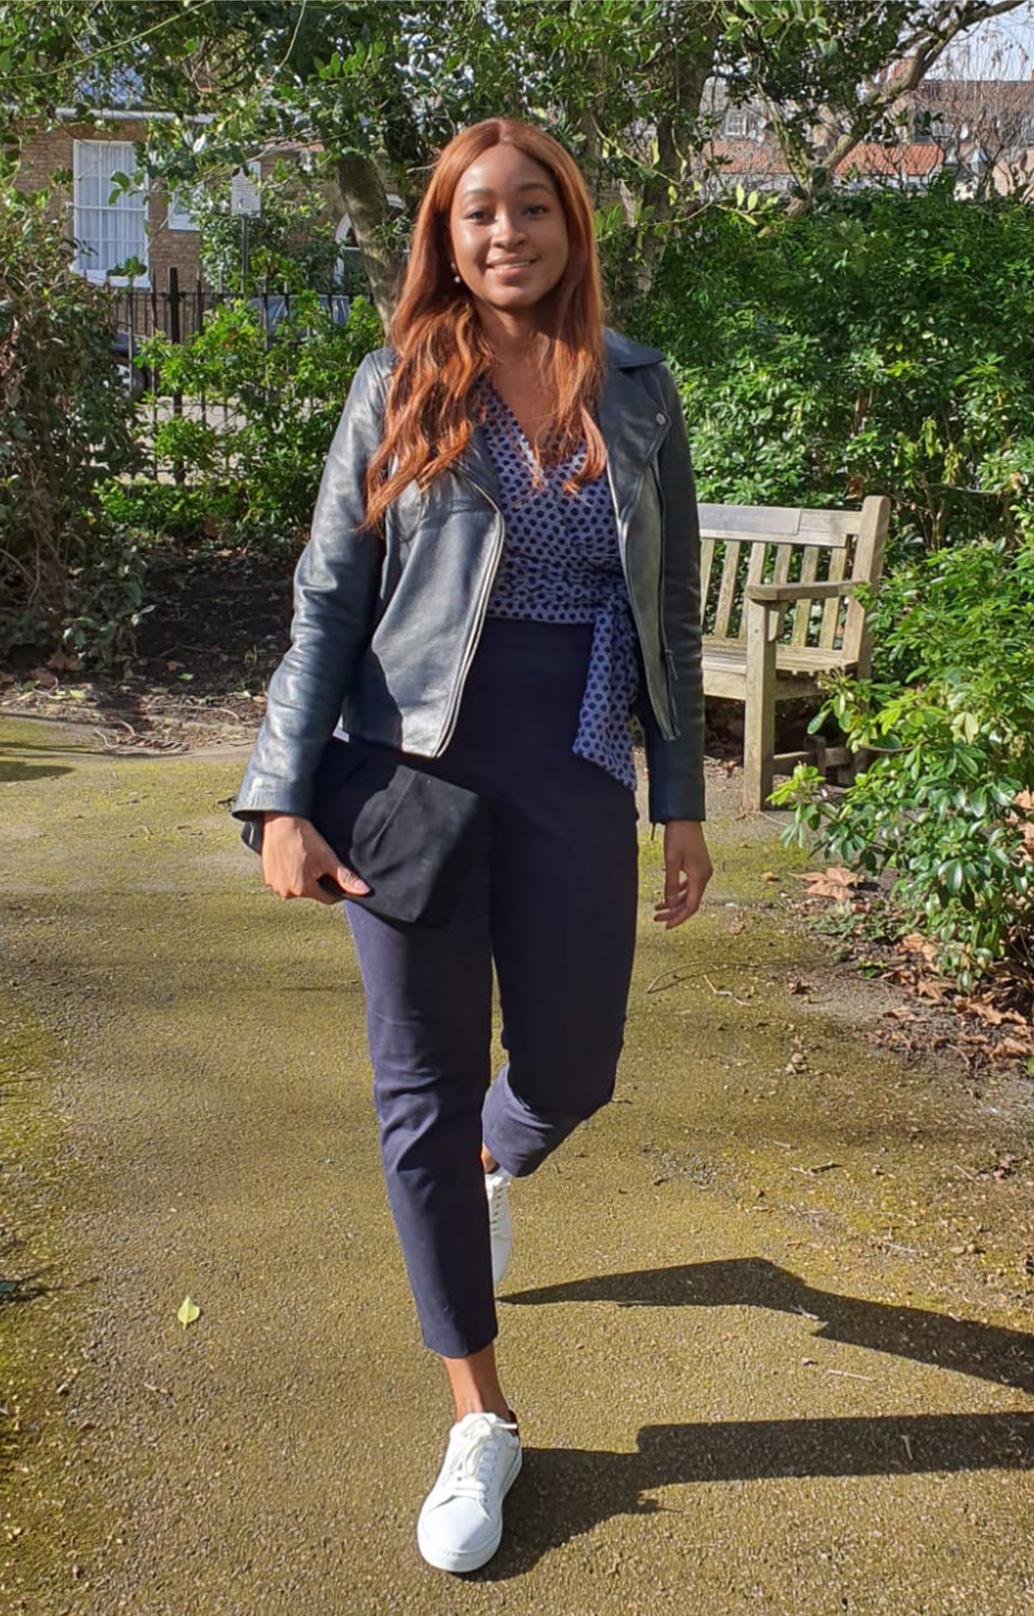 Fashion blogger @rufaro_styling photographed on a walk wearing Hobbs Tania navy leather jacket, Elizabeth Blouse and Yasmin capri trousers.